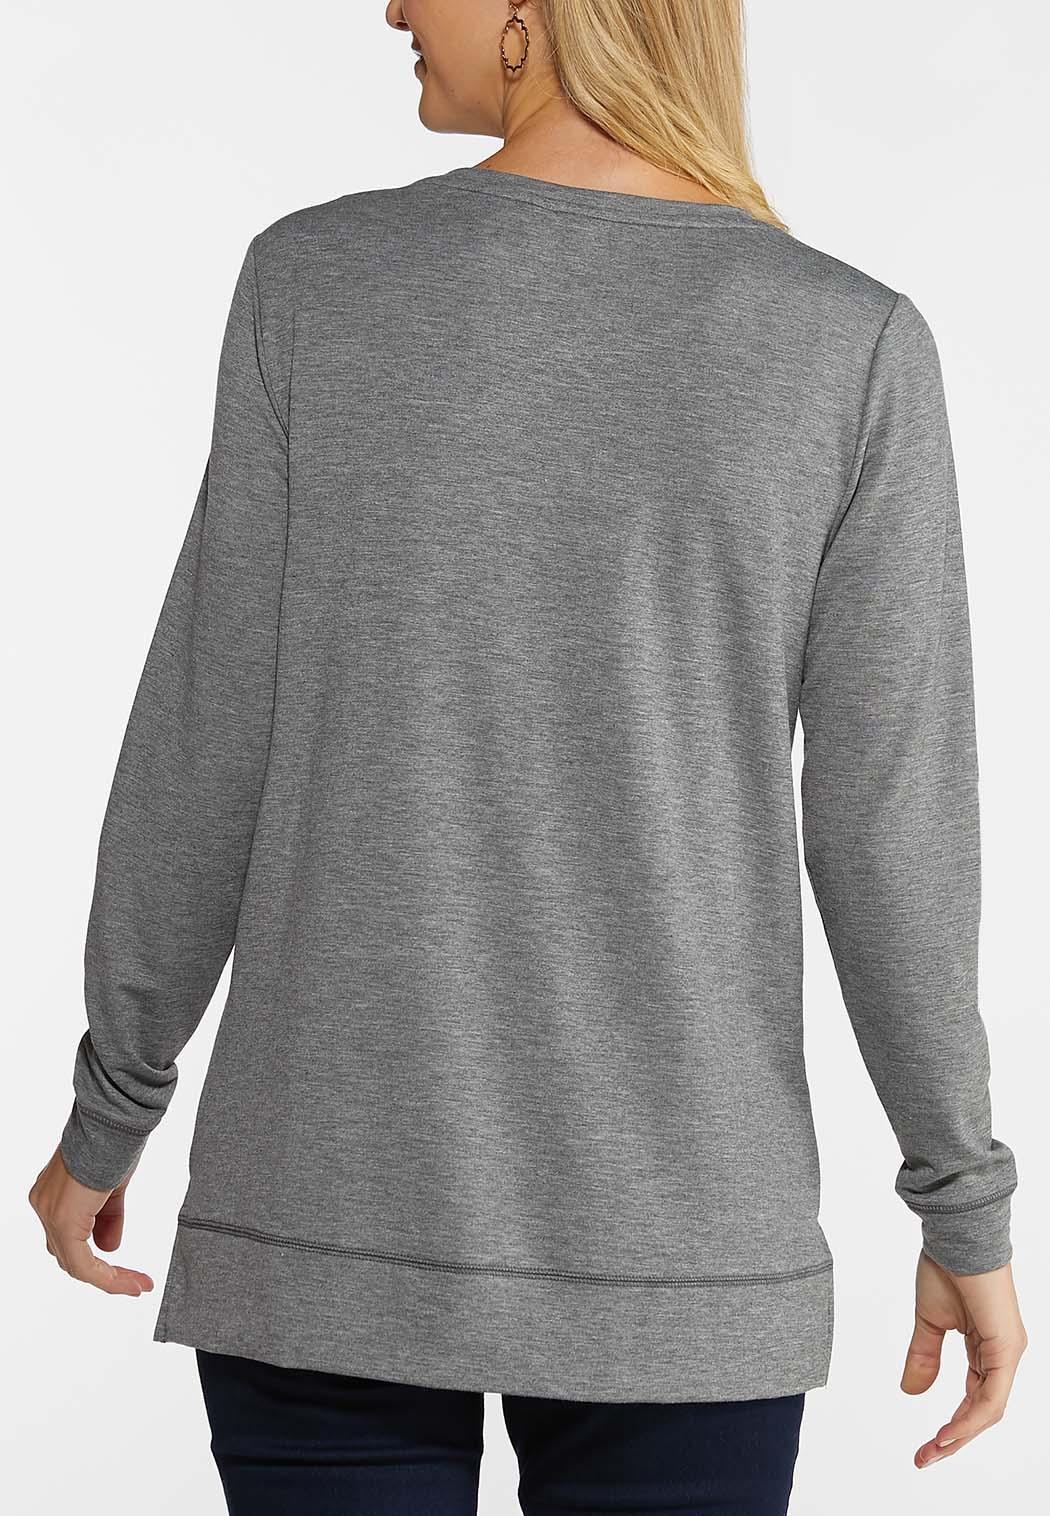 Plus Size Plaid Joy Sweatshirt (Item #44047181)